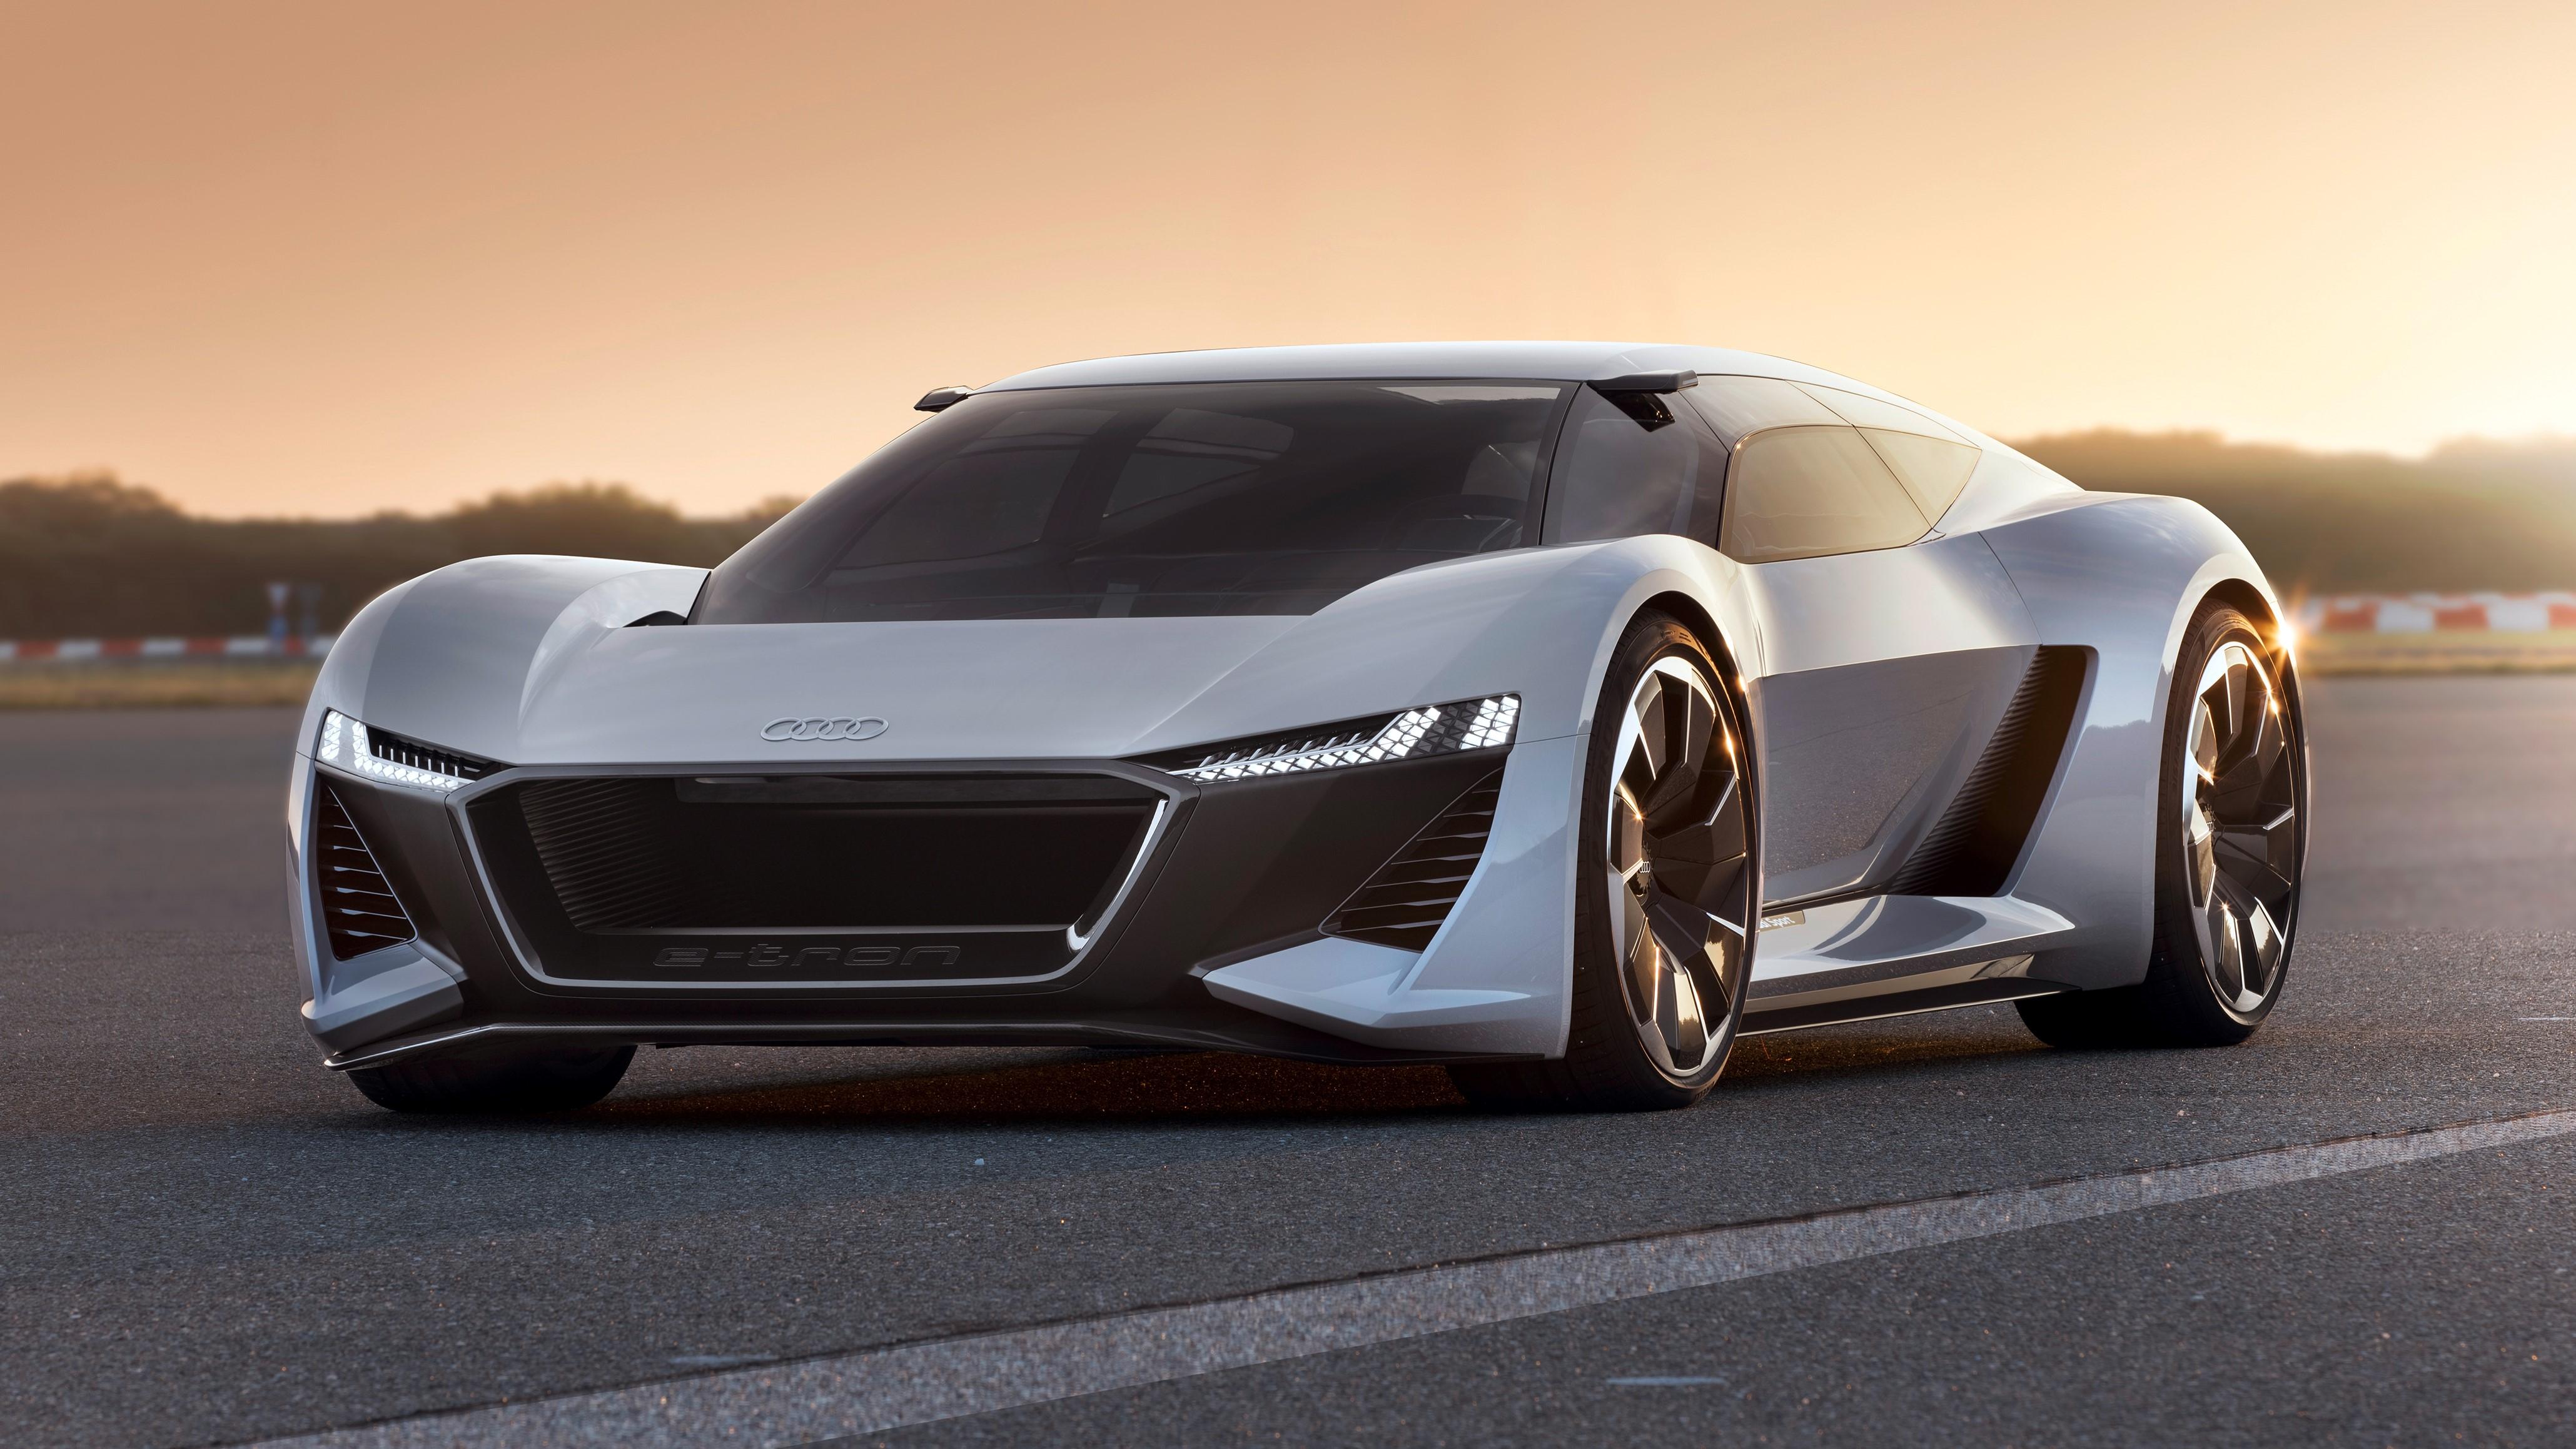 Audi PB18 e-tron concept.